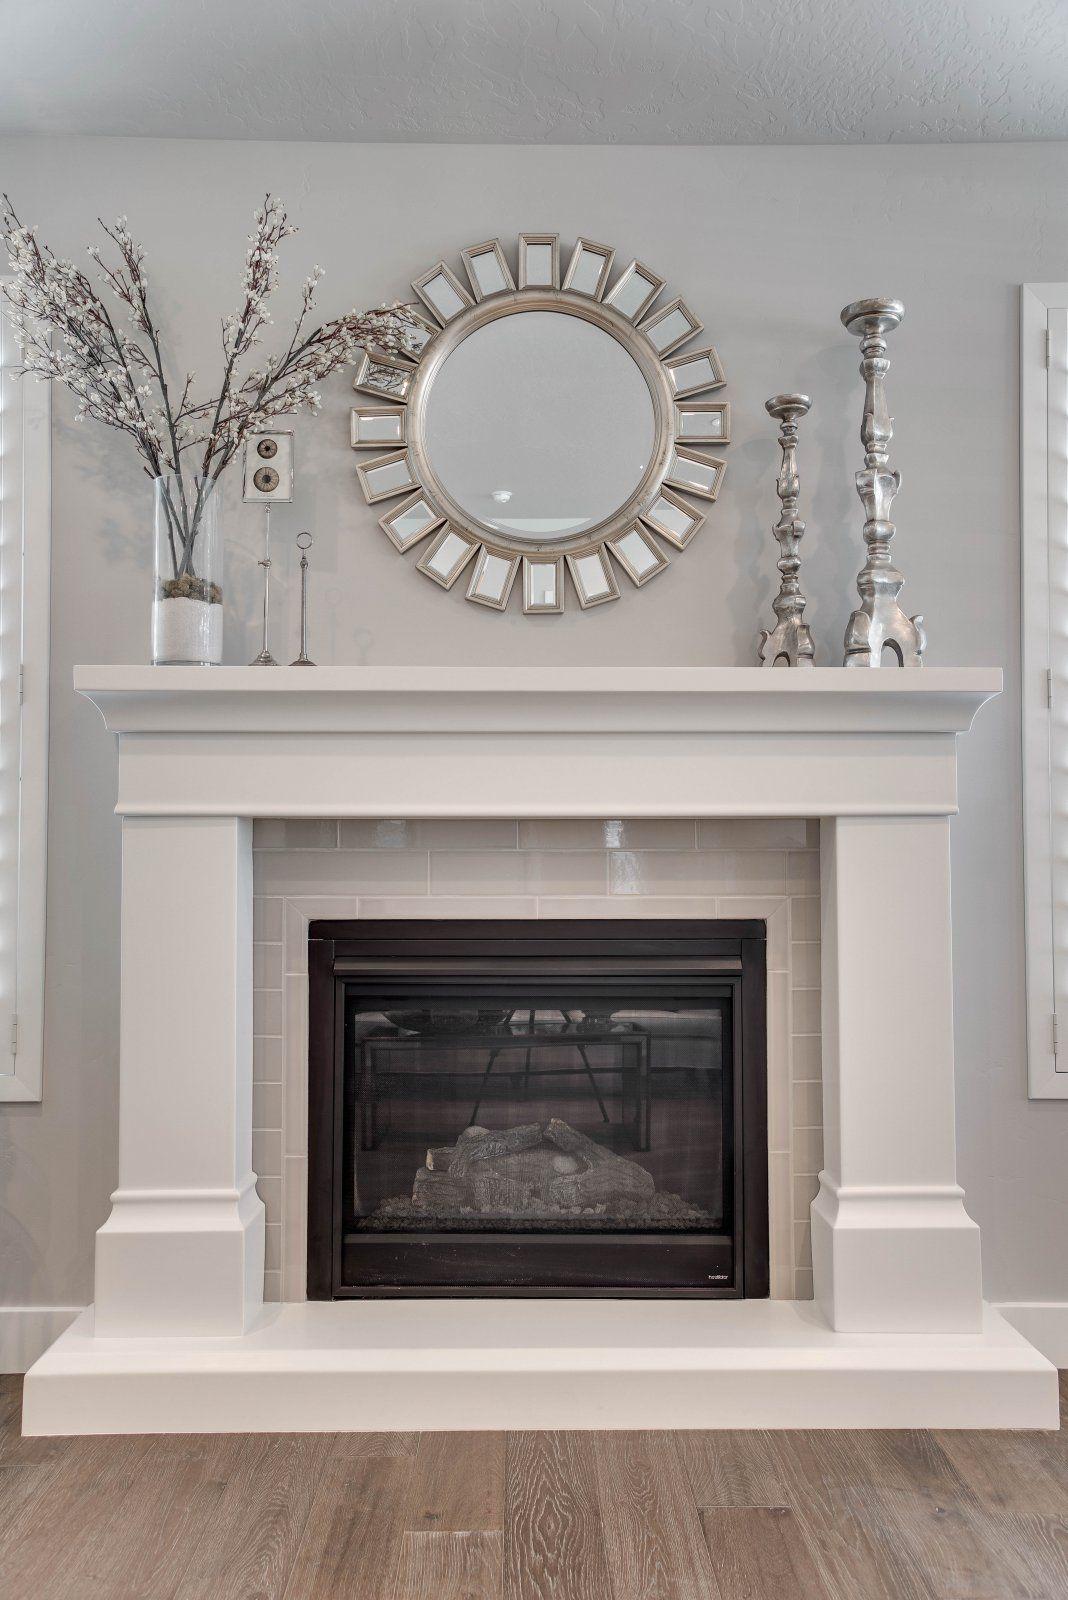 Beckham Fireplace Remodel Fireplace Mantle Decor Fireplace Design